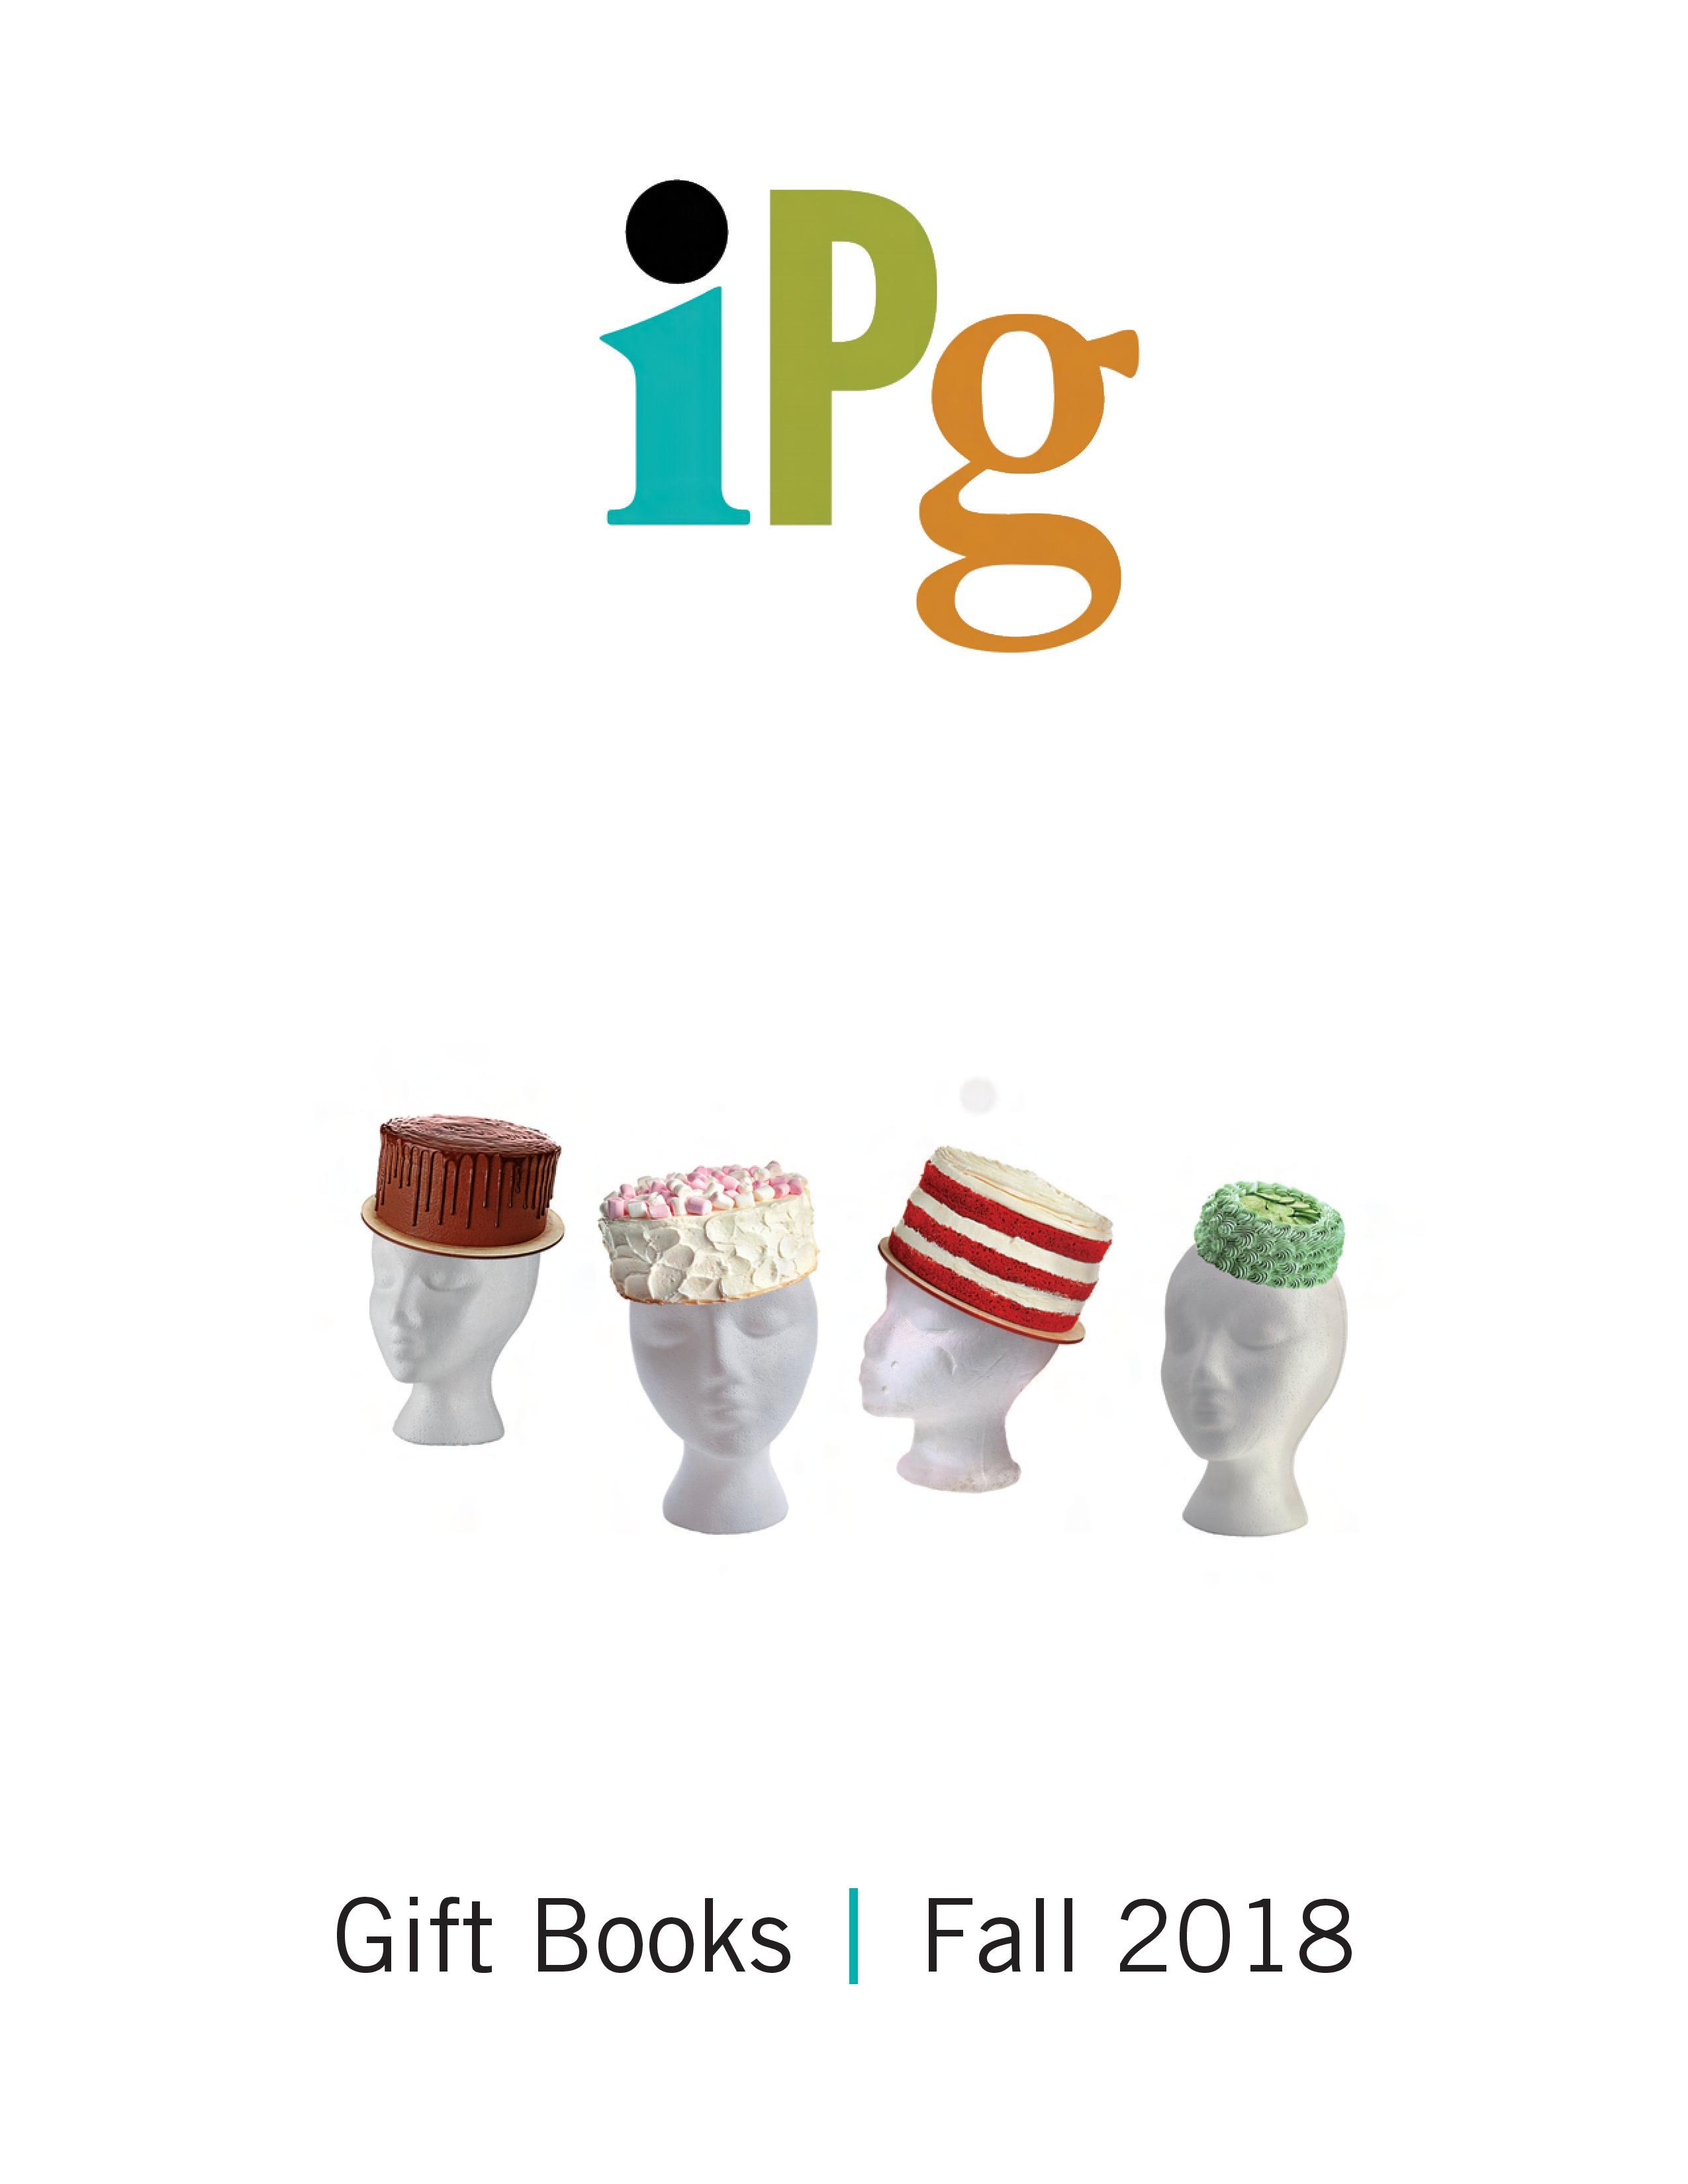 IPG Fall 2018 Gift Books Catalog